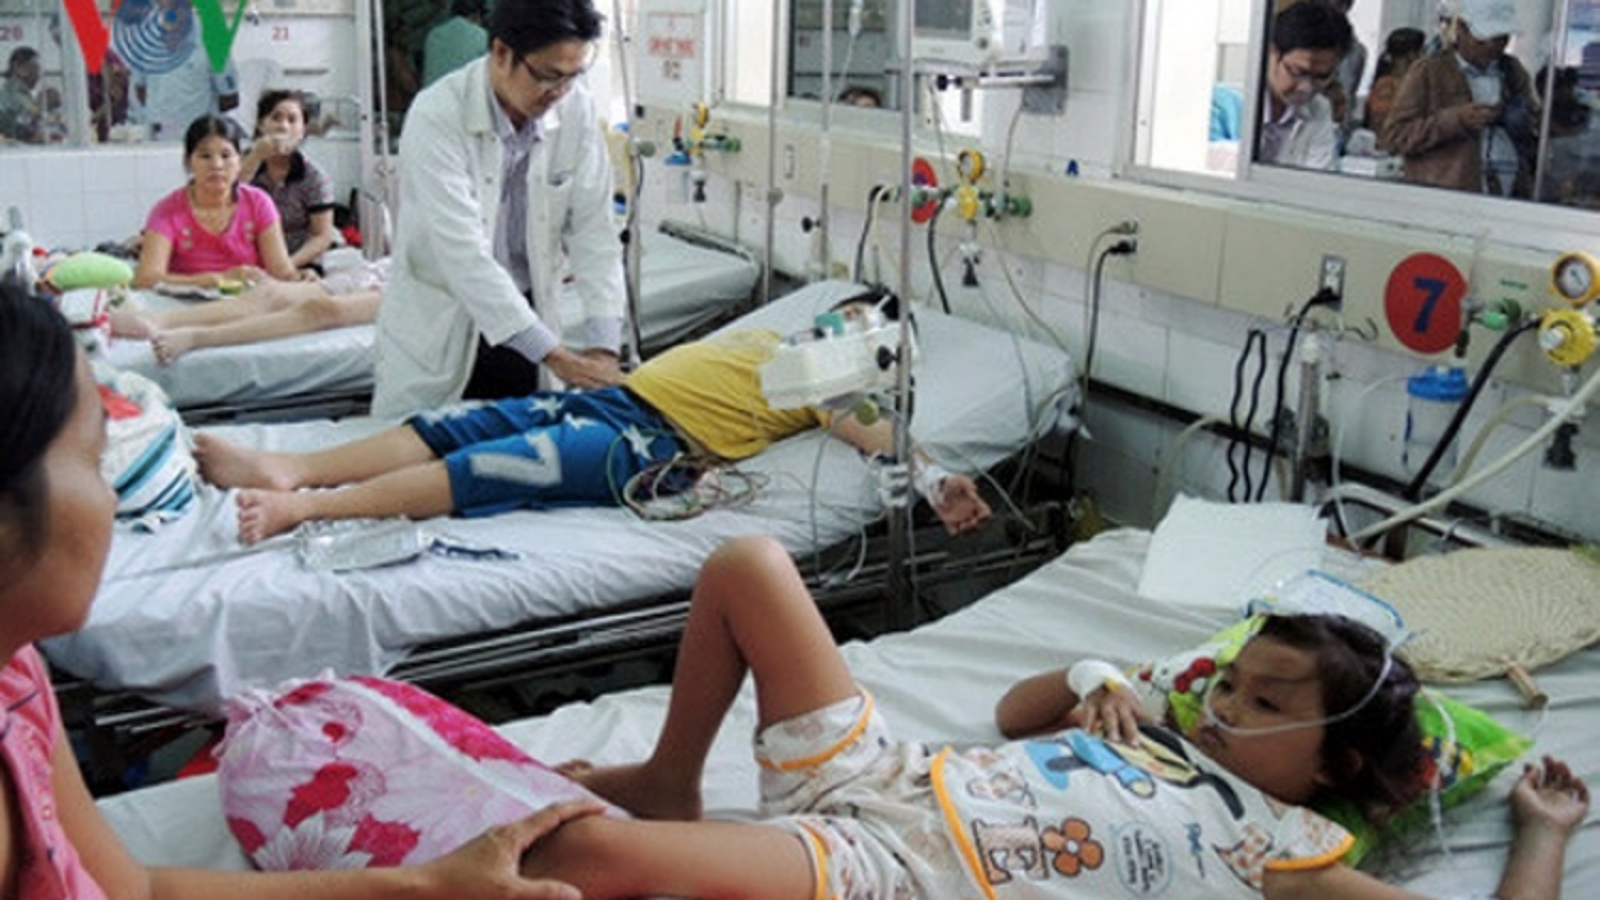 Dengue outbreak in Danang is worse than previous years